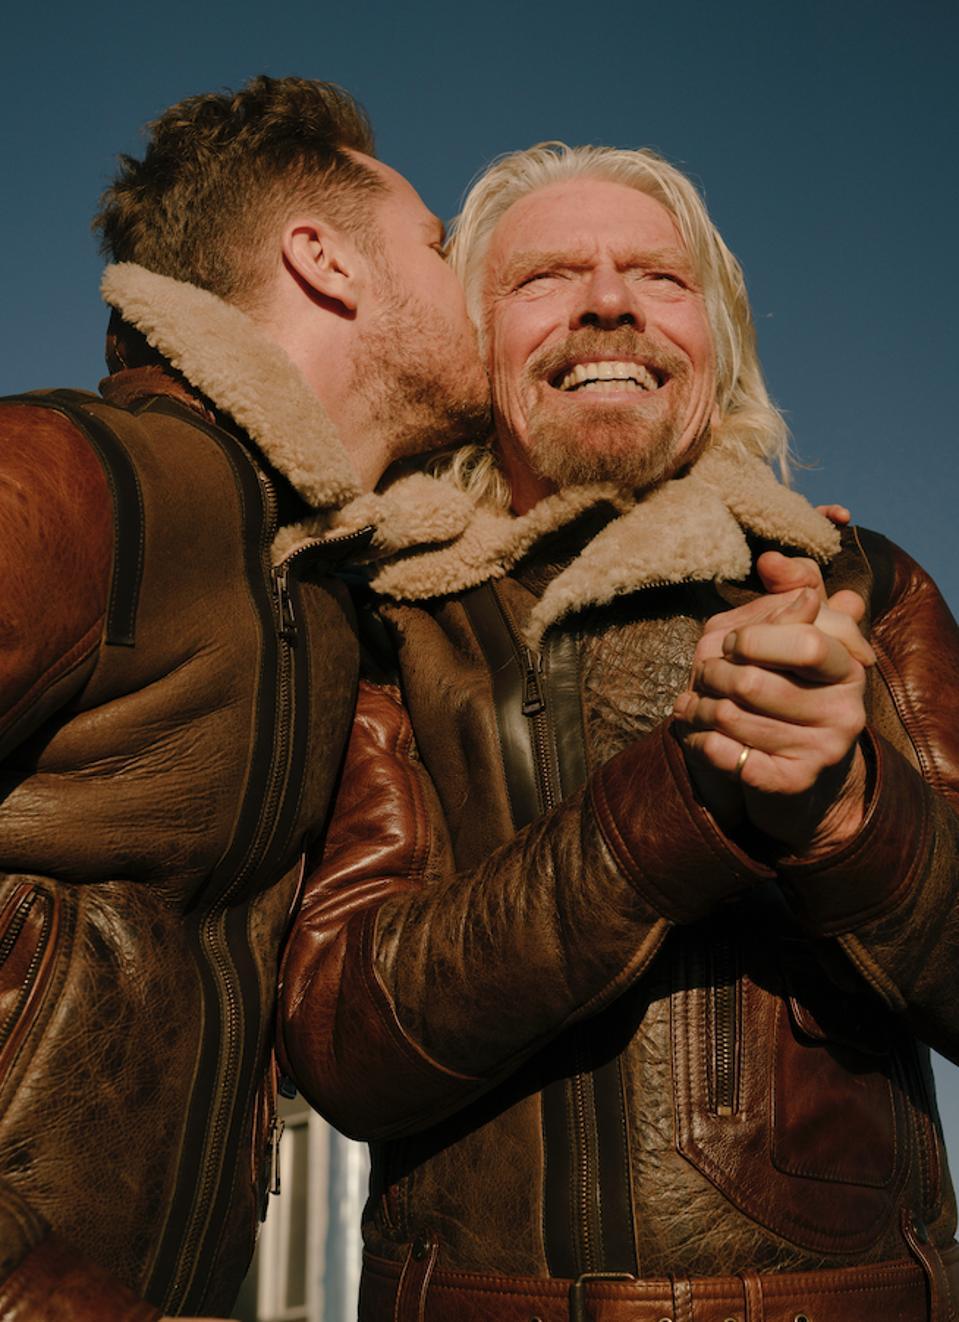 Sir Richard Branson with his son, Sam Branson